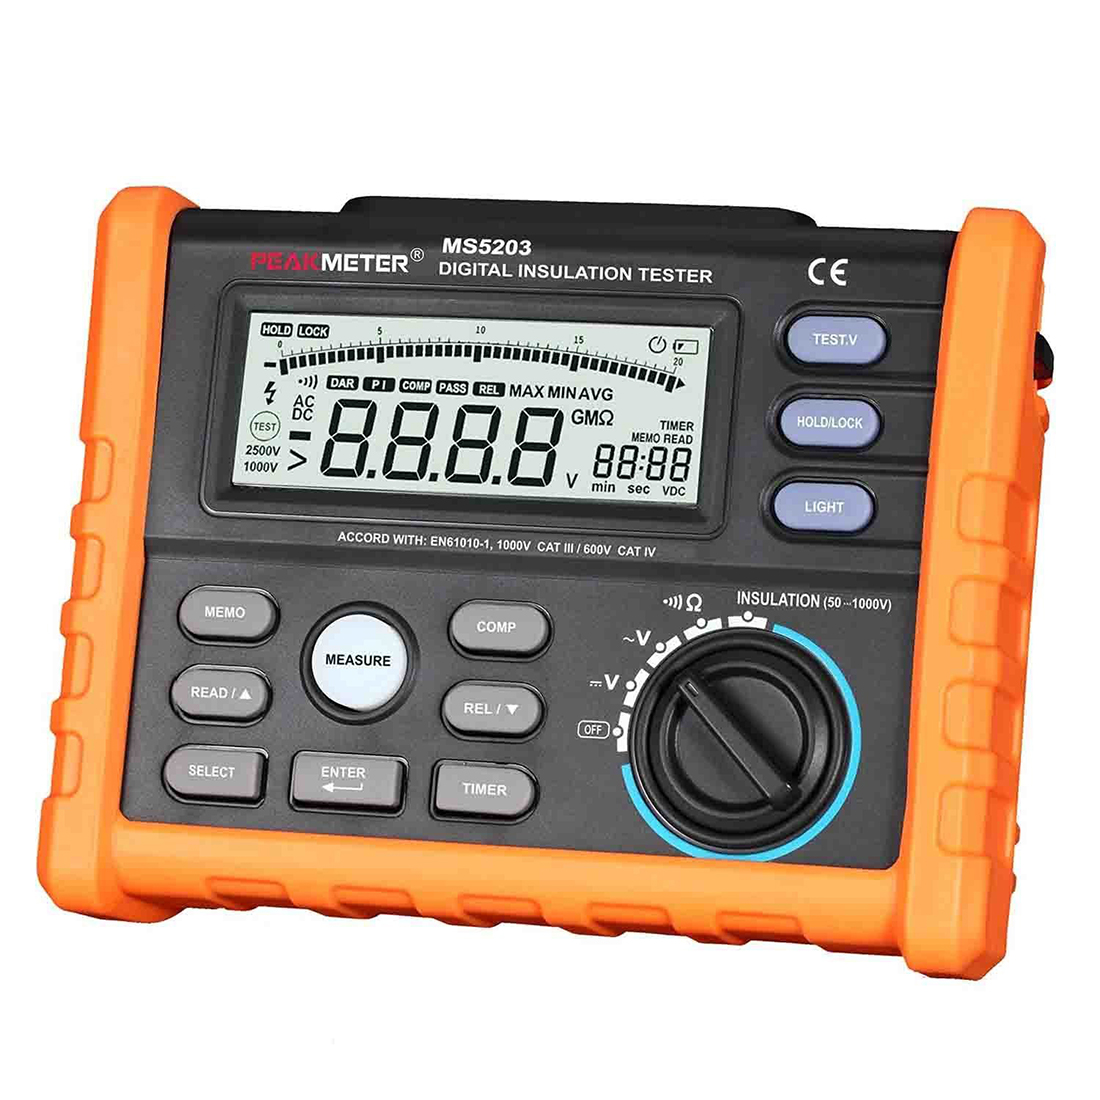 New Style PEAKMETER MS5203 Digital Insulation Resistance Meter Multimeter Megohm Meter Auto power Off stc диана 5203